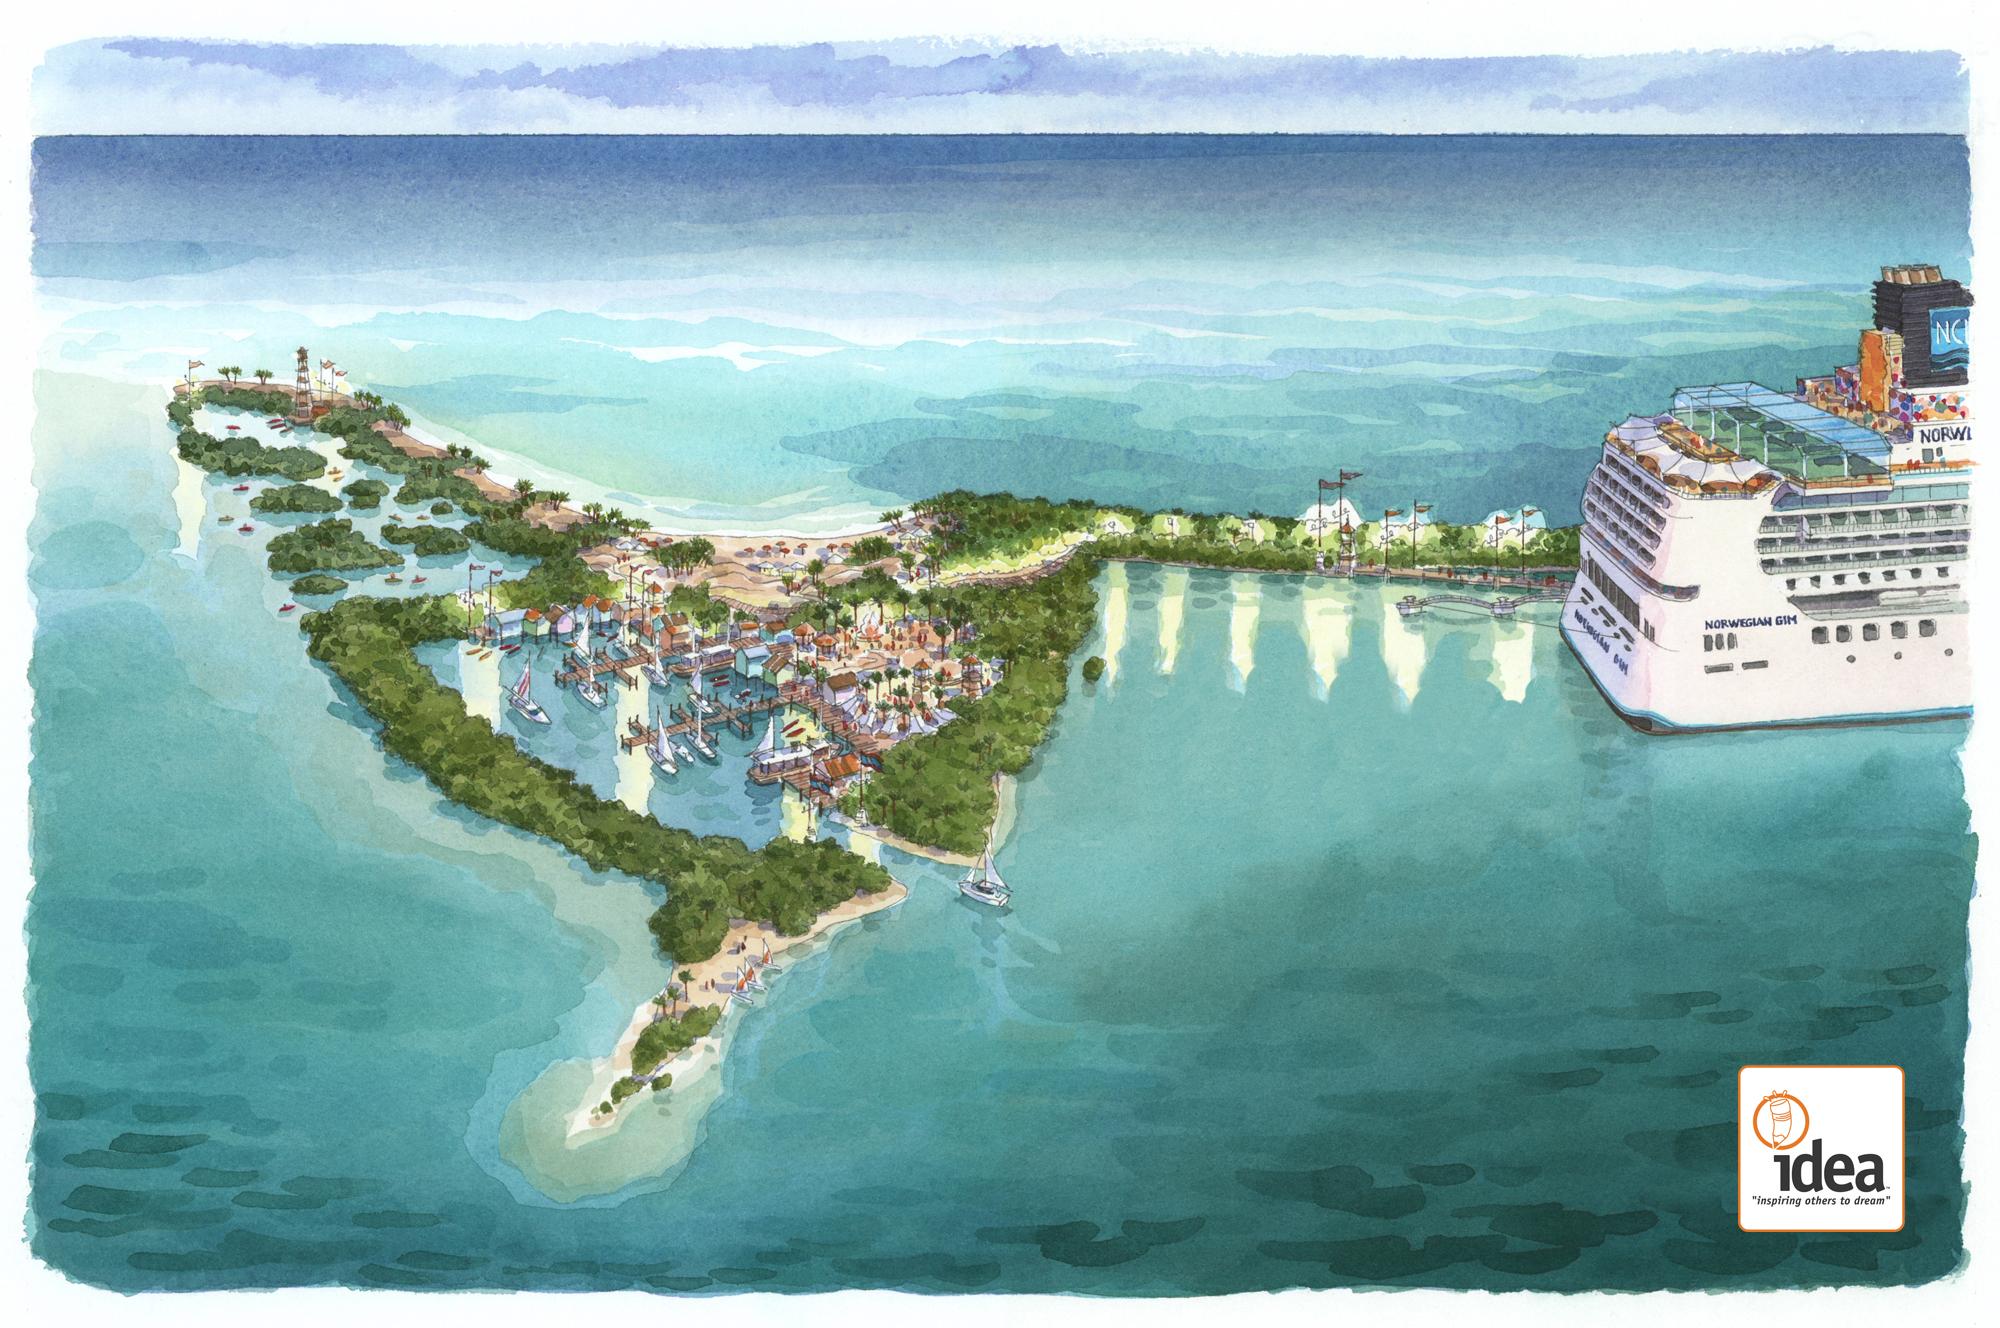 Harvest Caye Project Belize